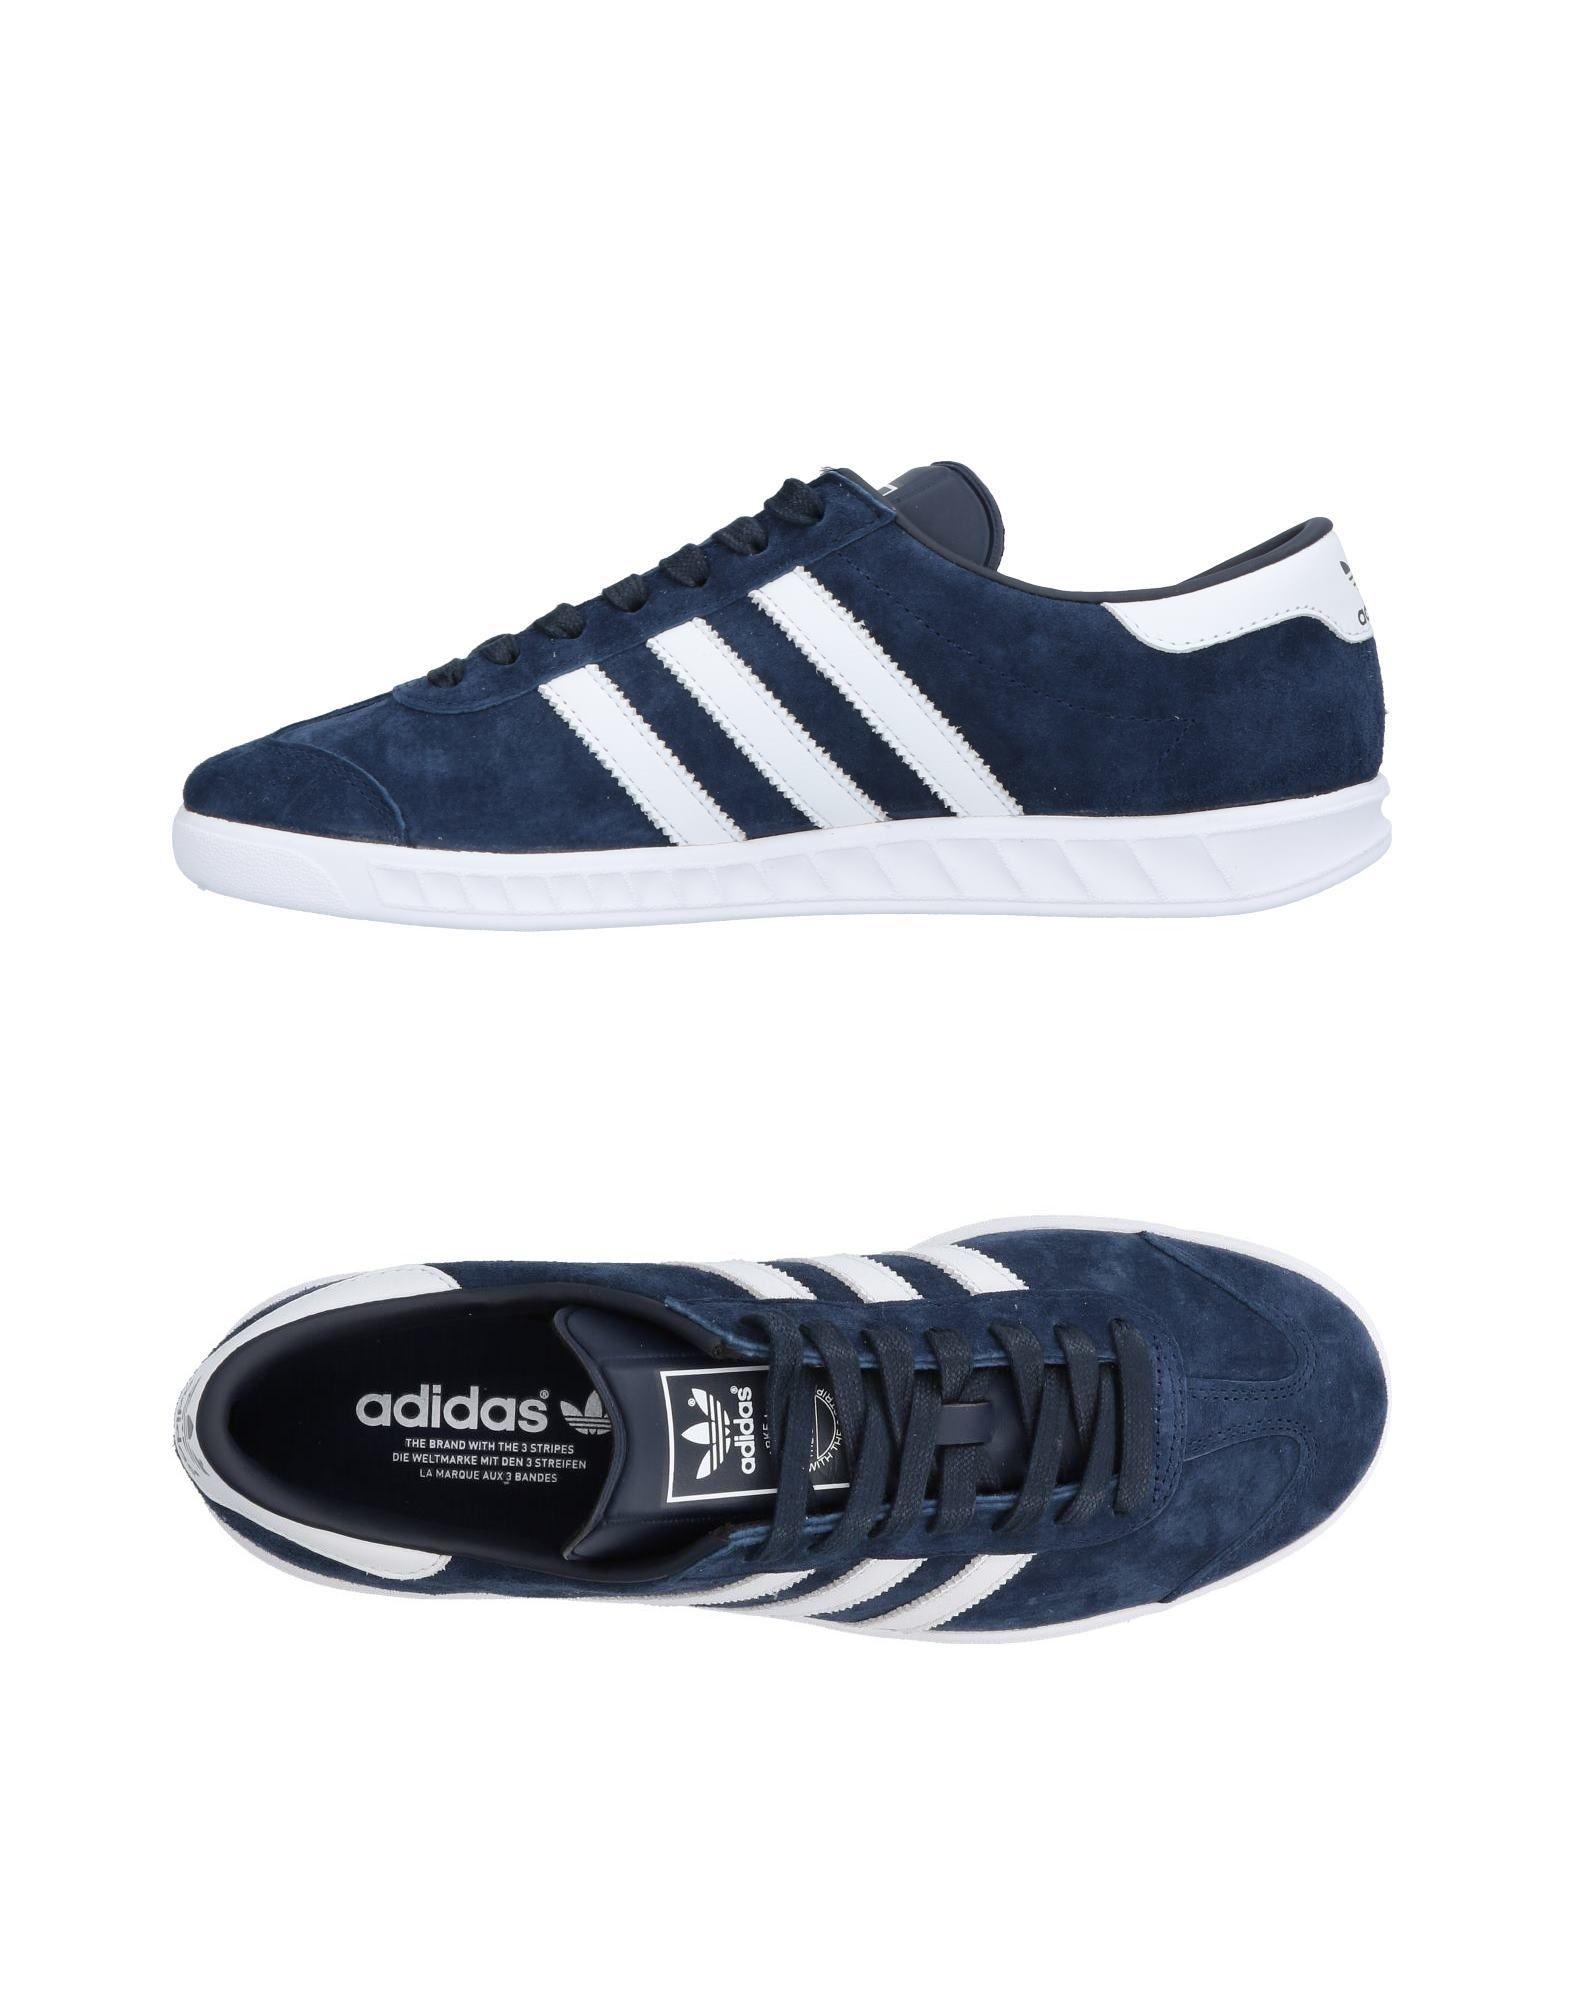 Sneakers Adidas Originals Uomo - 11465172OD